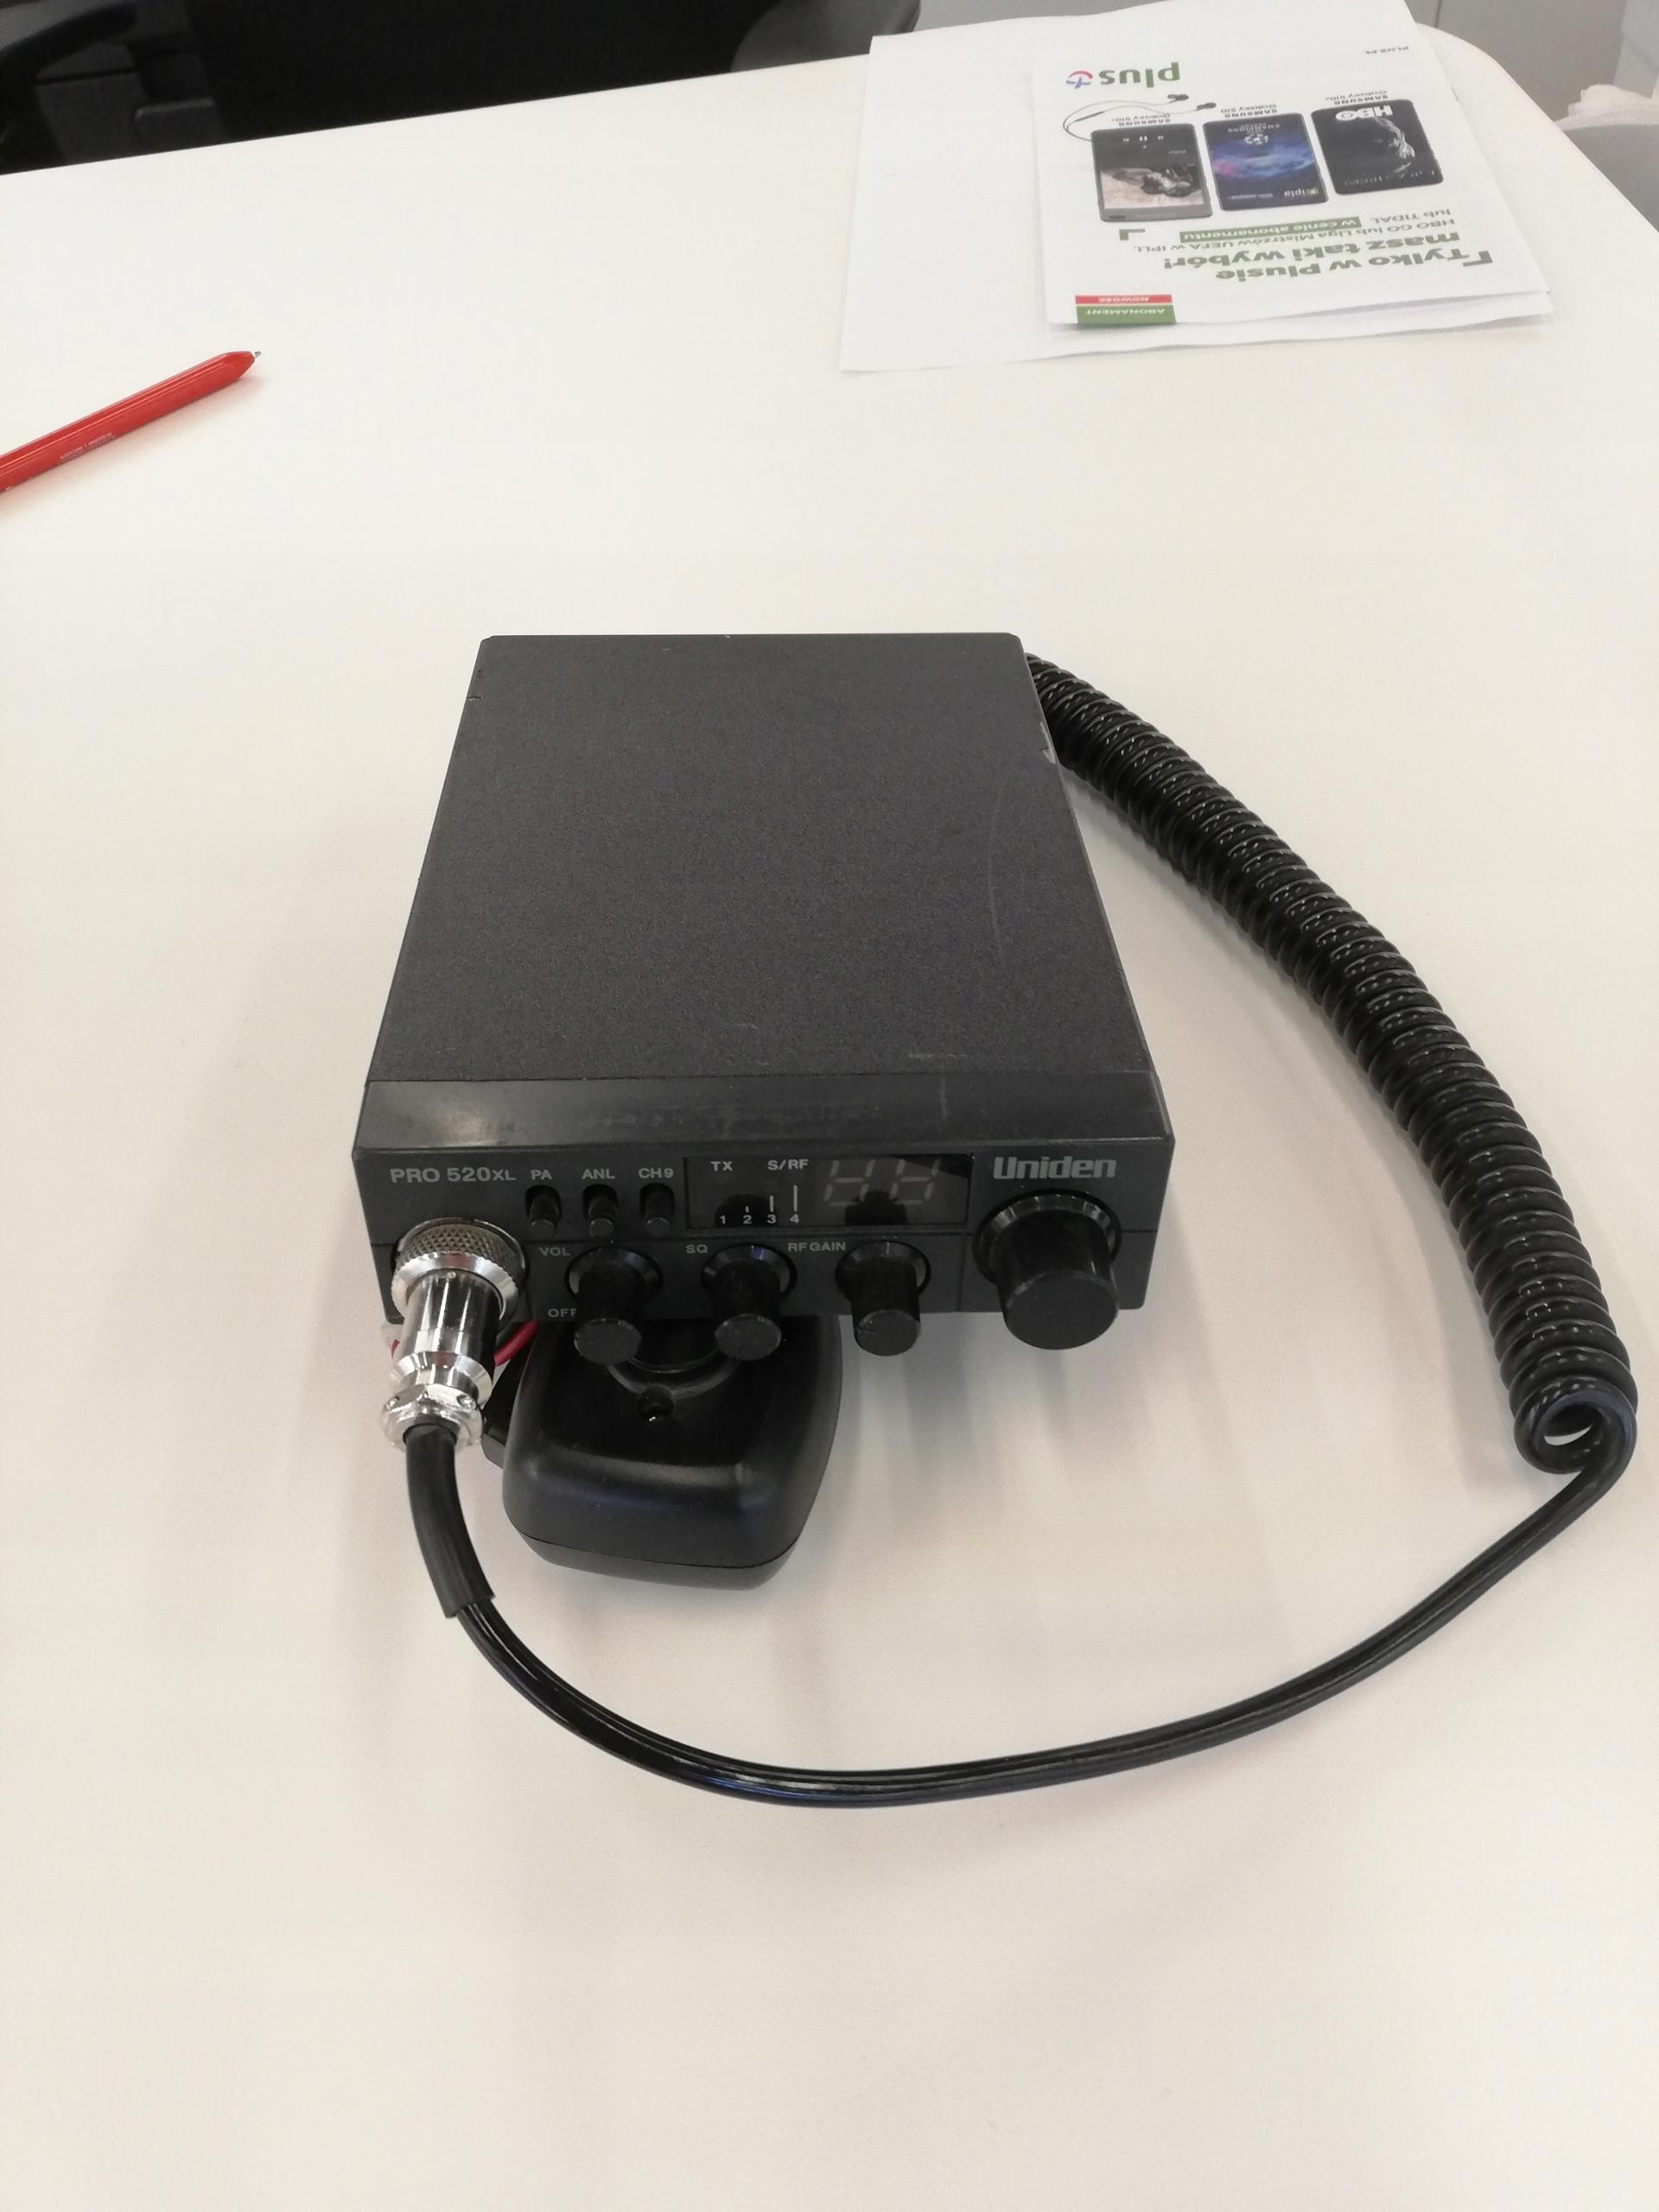 CB Radio Uniden 520 XL